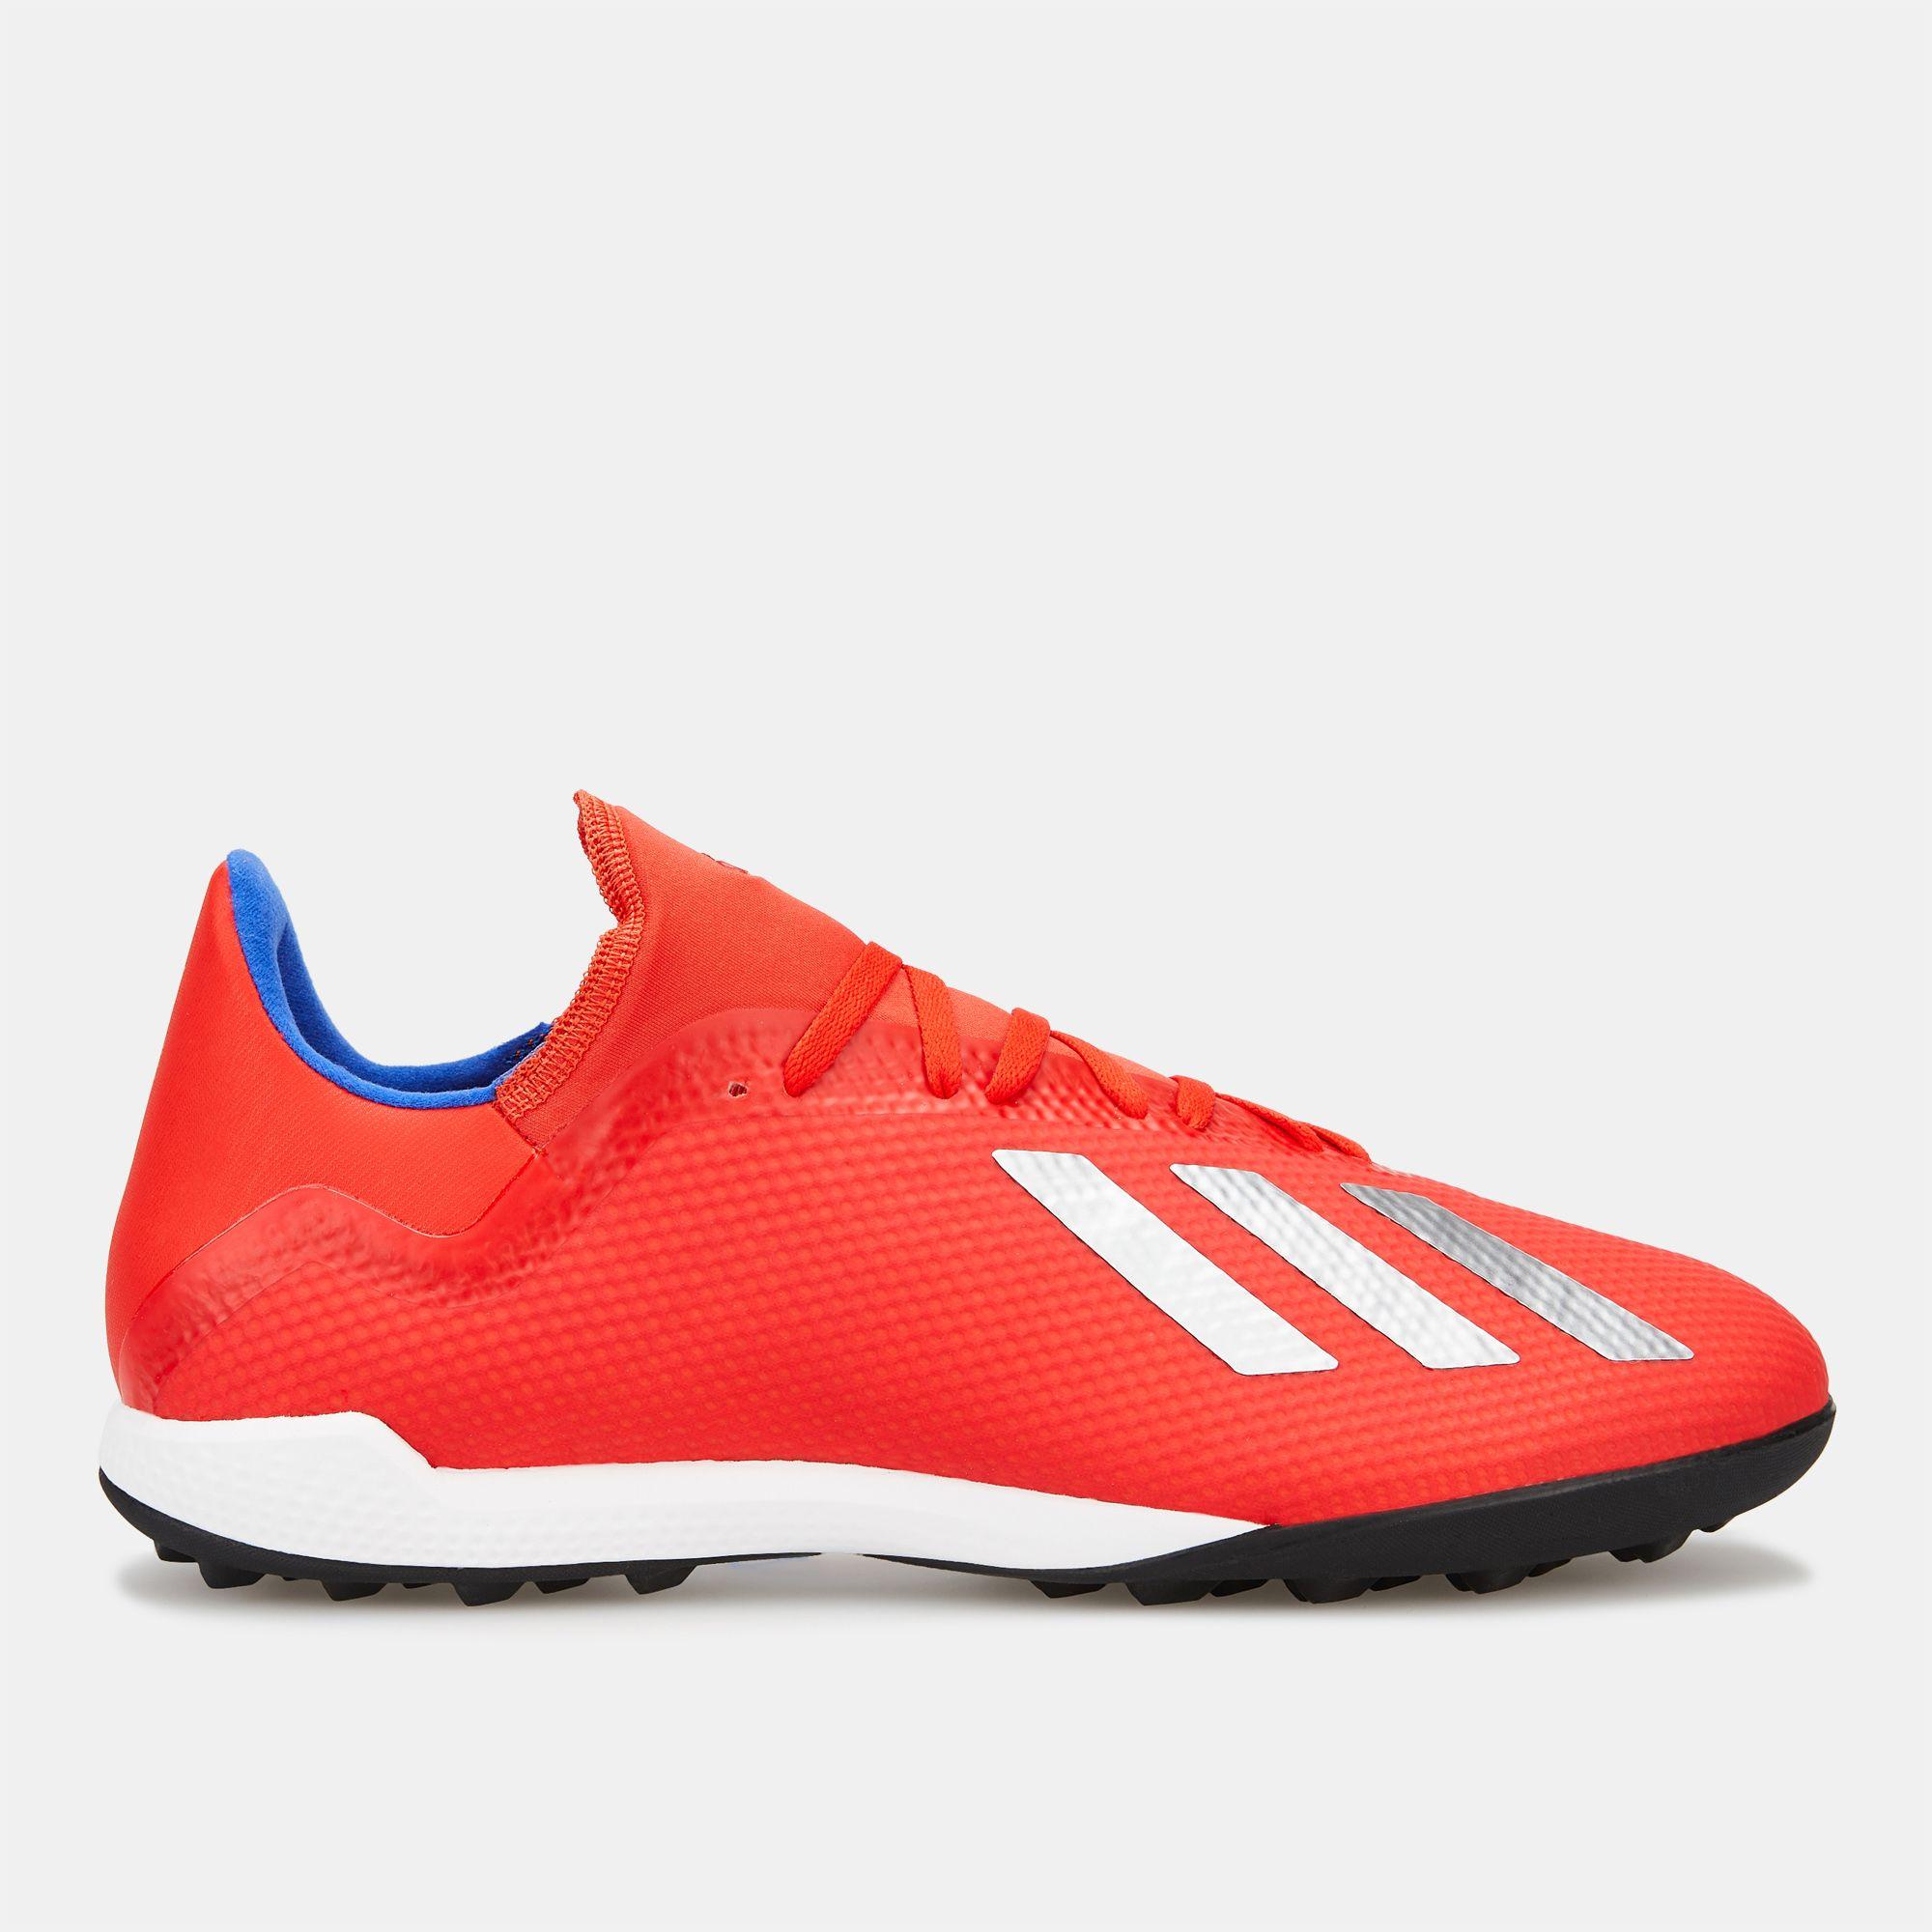 6216609fa adidas Men s Exhibit Pack X Tango 18.3 Turf Football Shoe